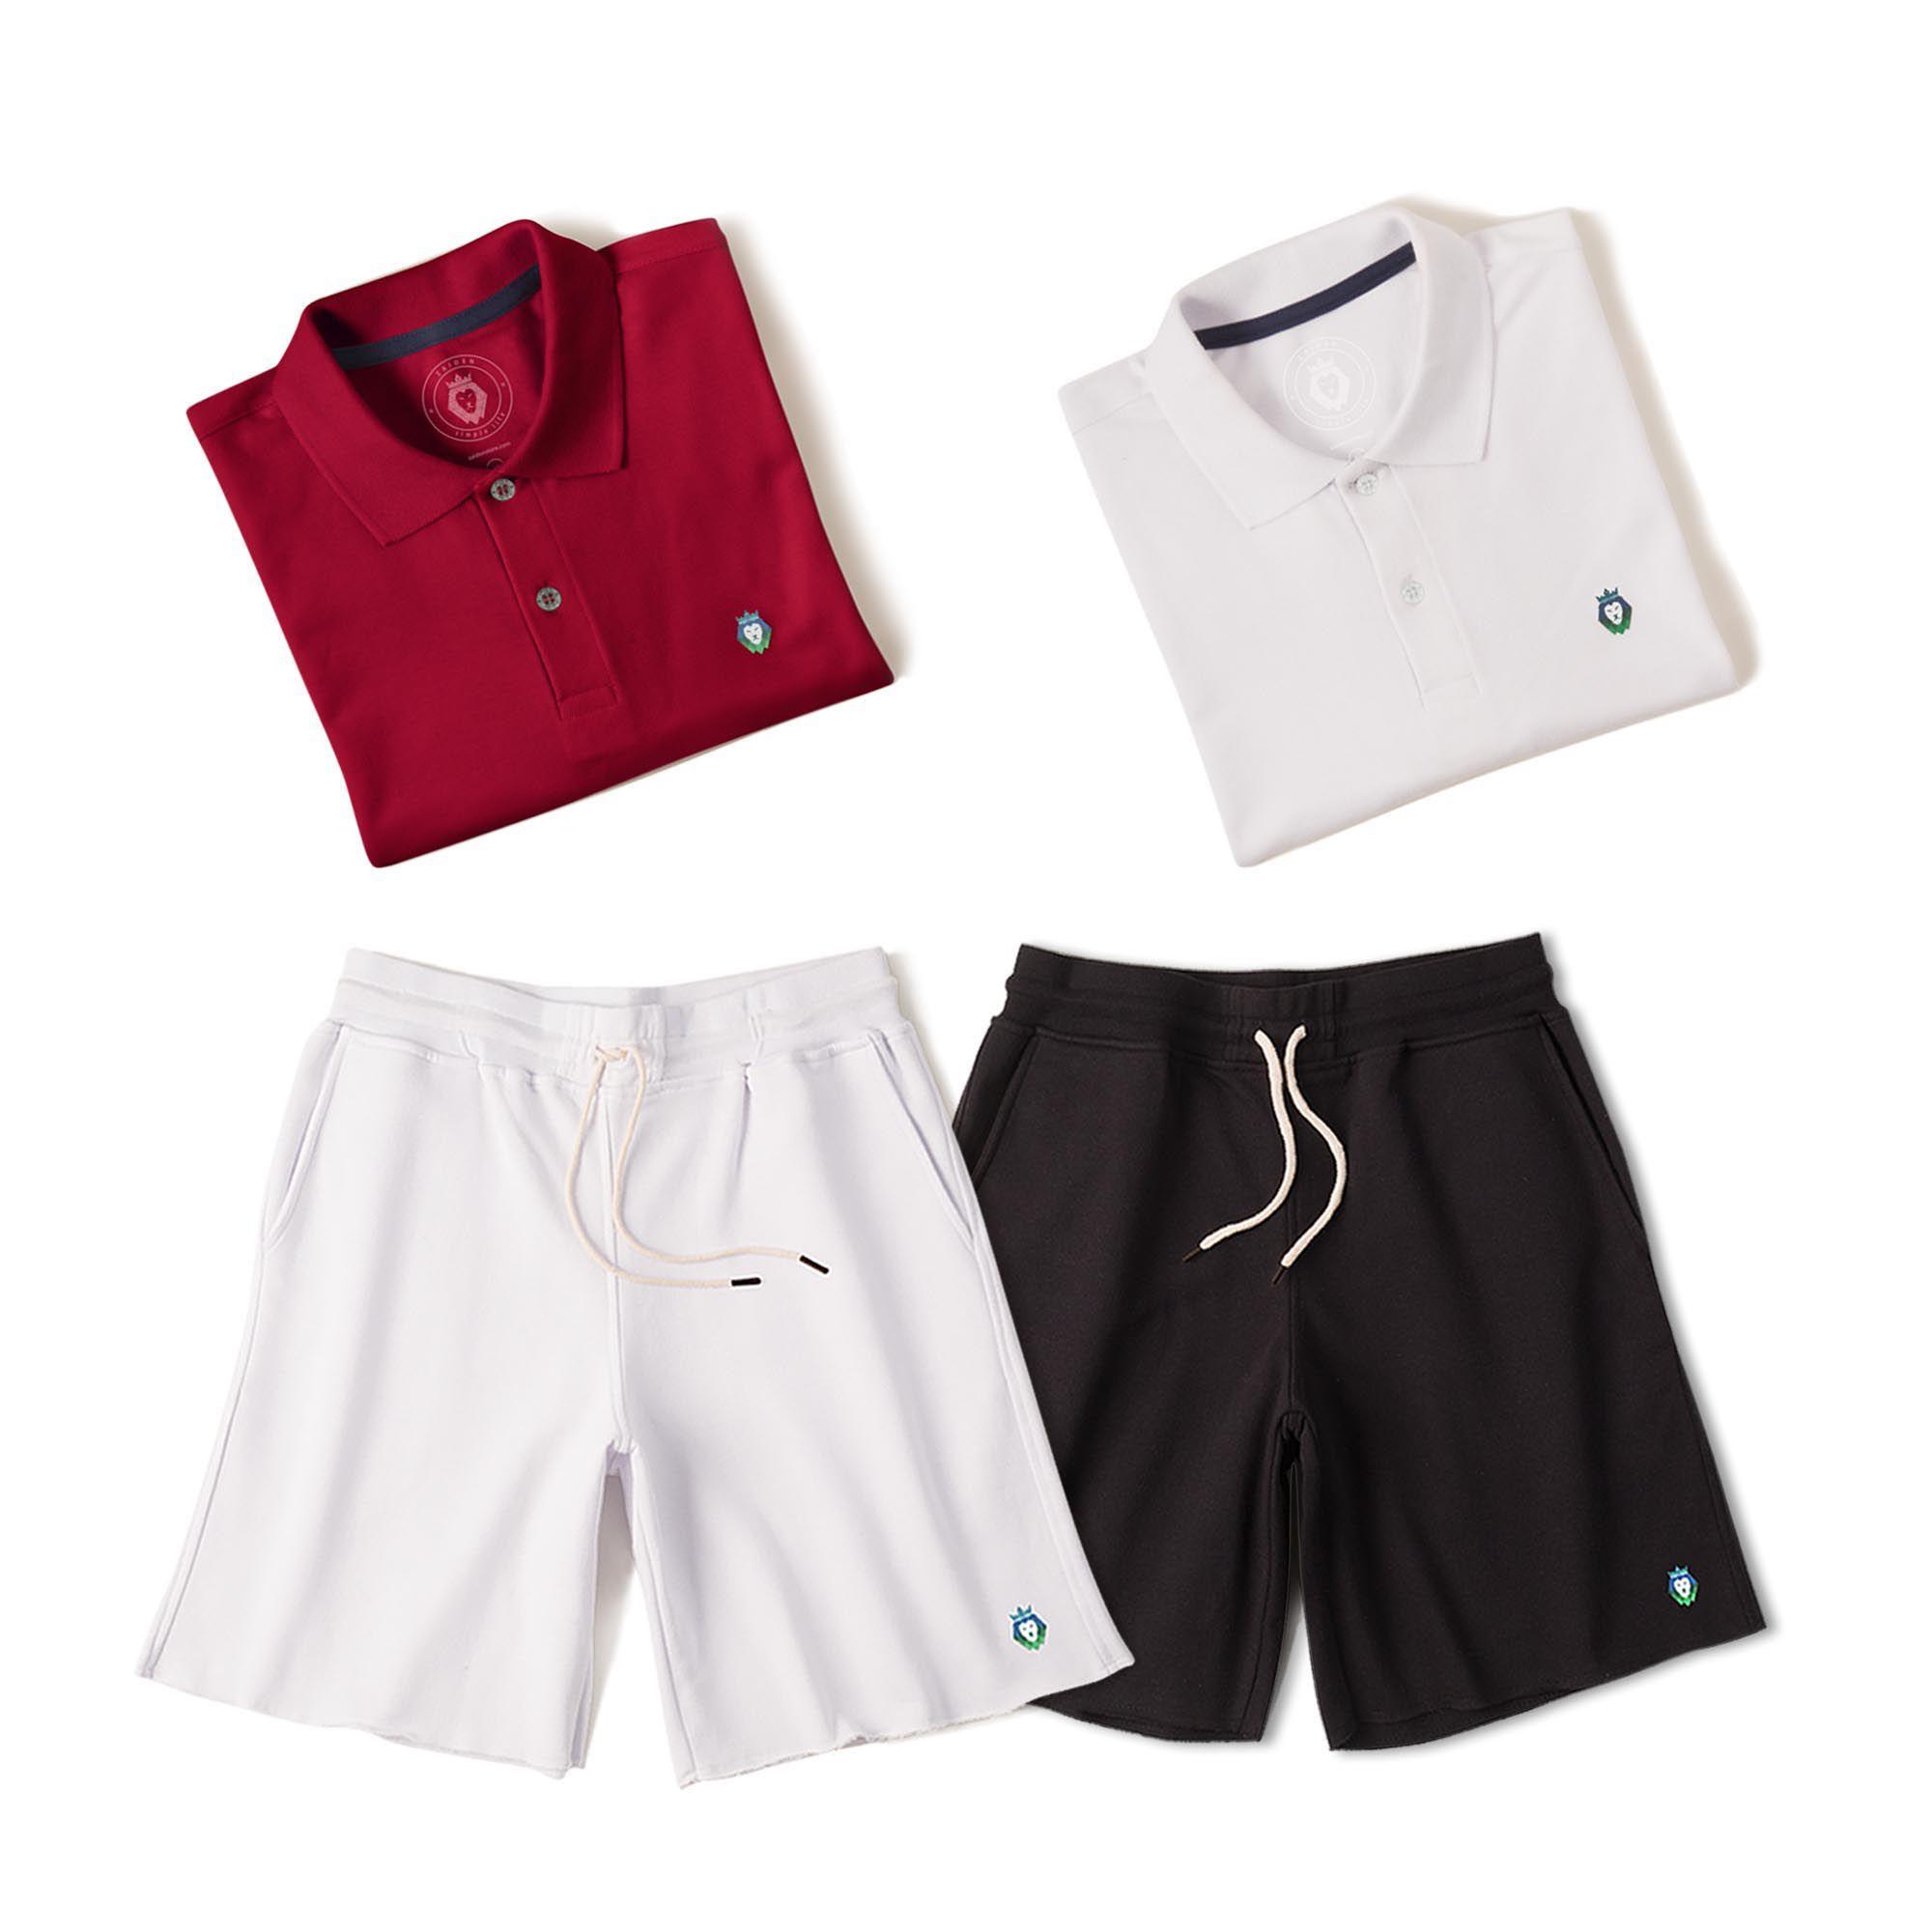 Kit 2 Bermudas Basic Preta Branca + 2 Camisas Polo Style Branca Bordô Zaiden Masculina